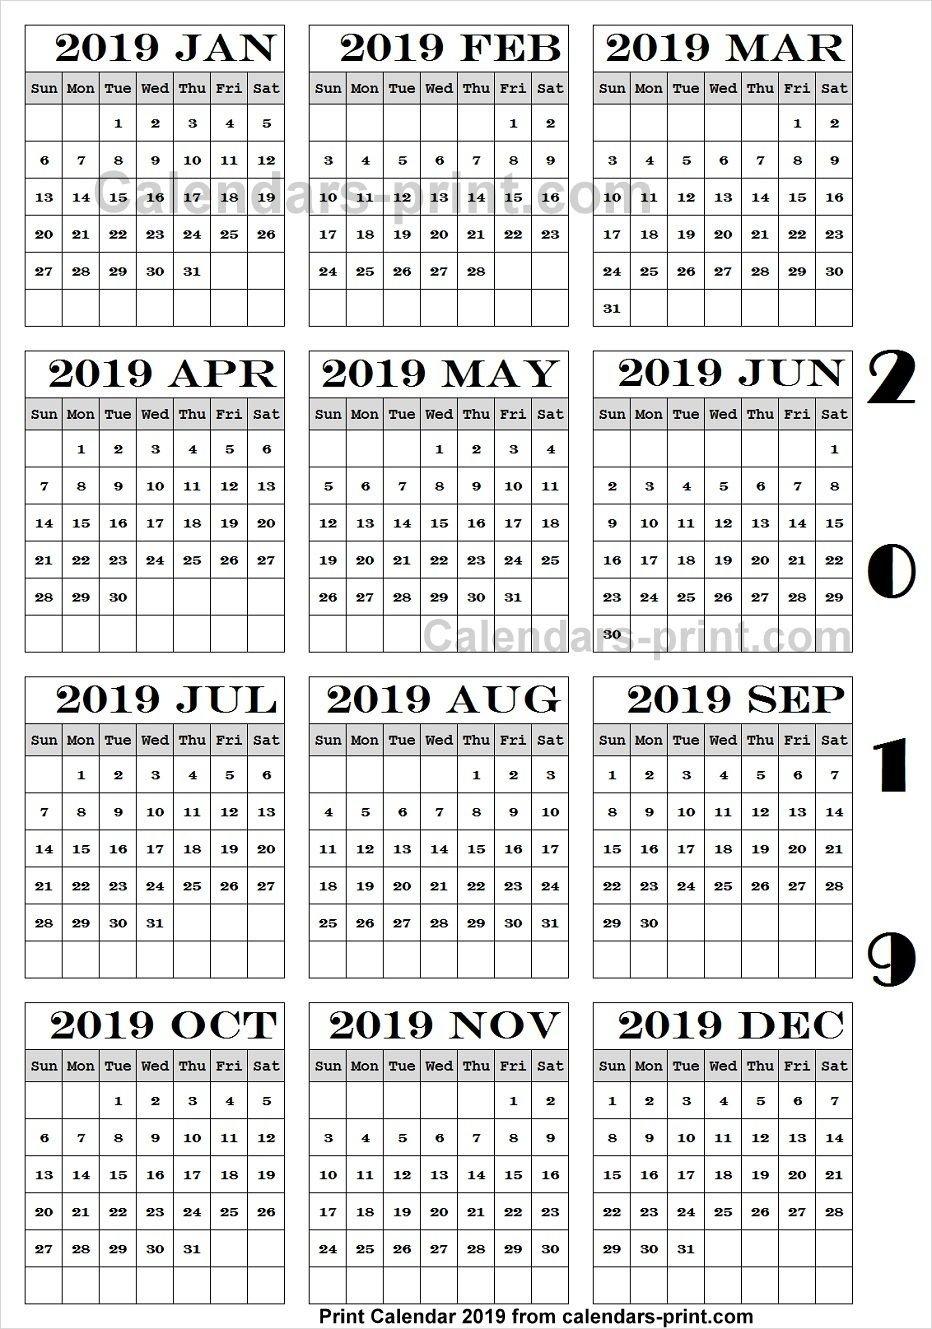 Calendar 2019 Pdf Download   2019 Yearly Calendar   Print Calendar Calendar 2019 Liga Mx